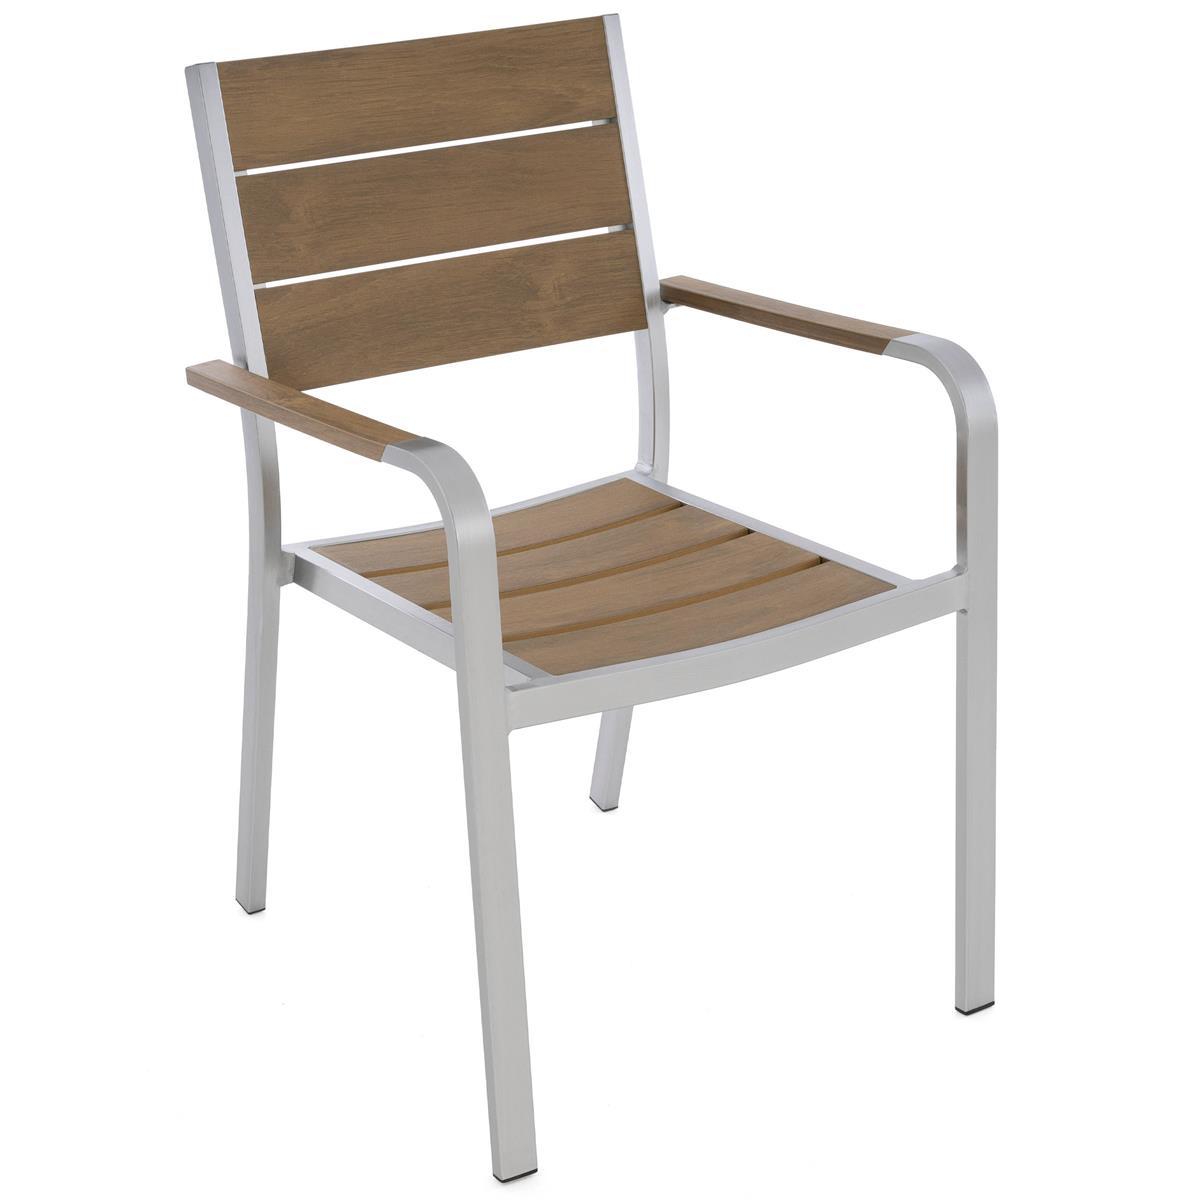 Gartenstuhl mit Armlehnen Aluminium Polywood Stapelstuhl 88x55x57 cm Gartenmöbel